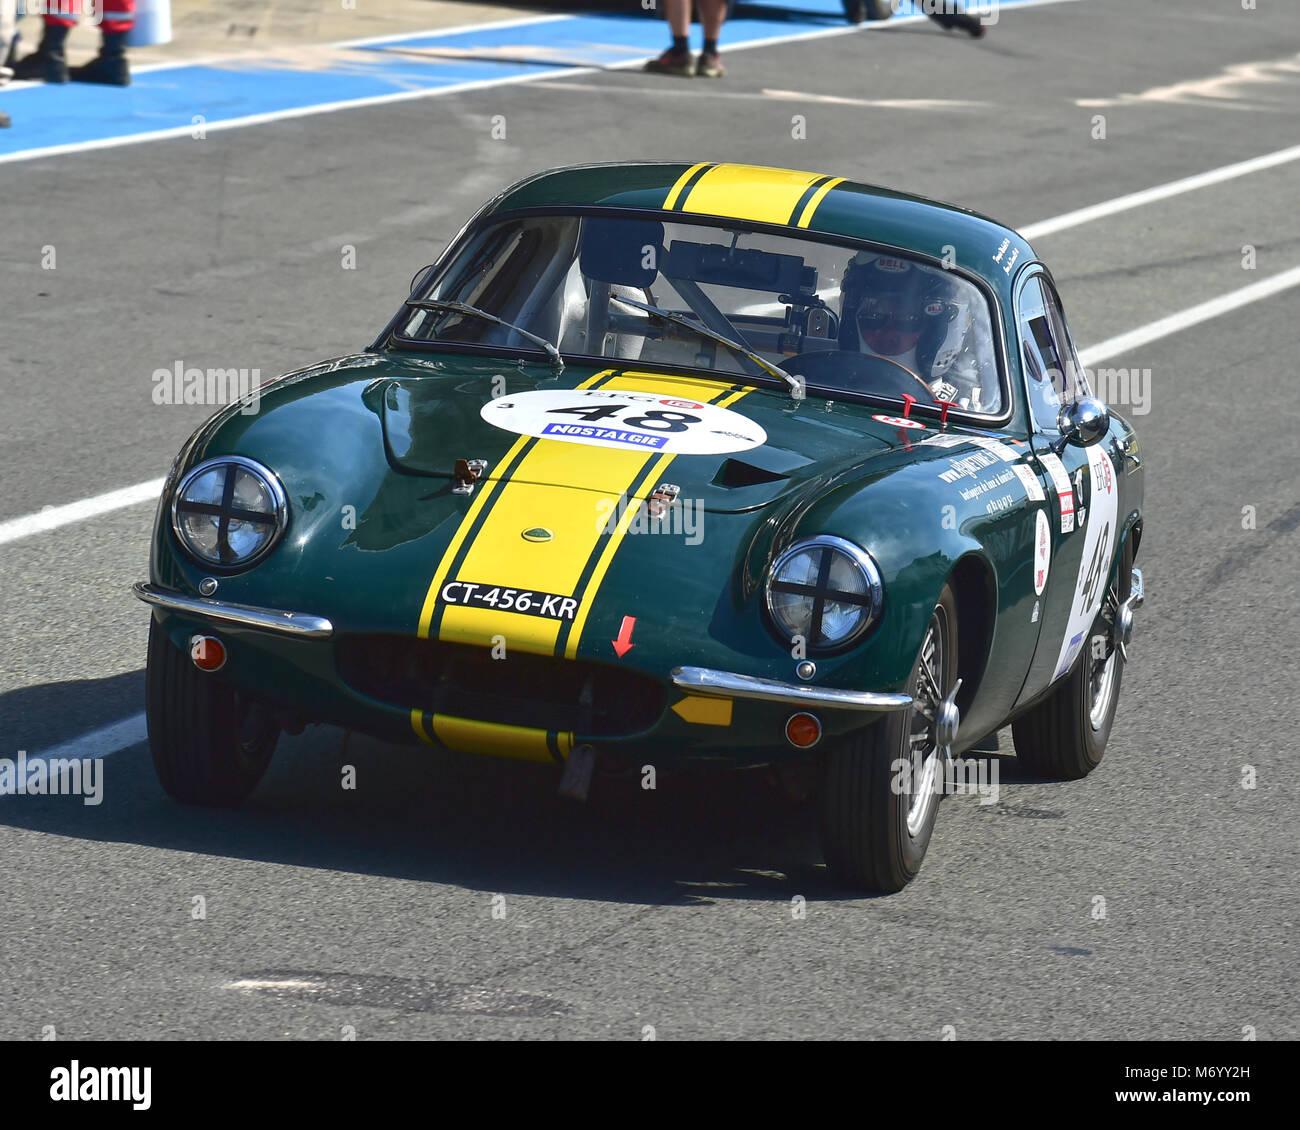 Jean-Luc Durand, Francois Marbeck, Lotus Elite, Le Mans Classic 2016, 2016, circuit racing,  Classic, classic cars, - Stock Image